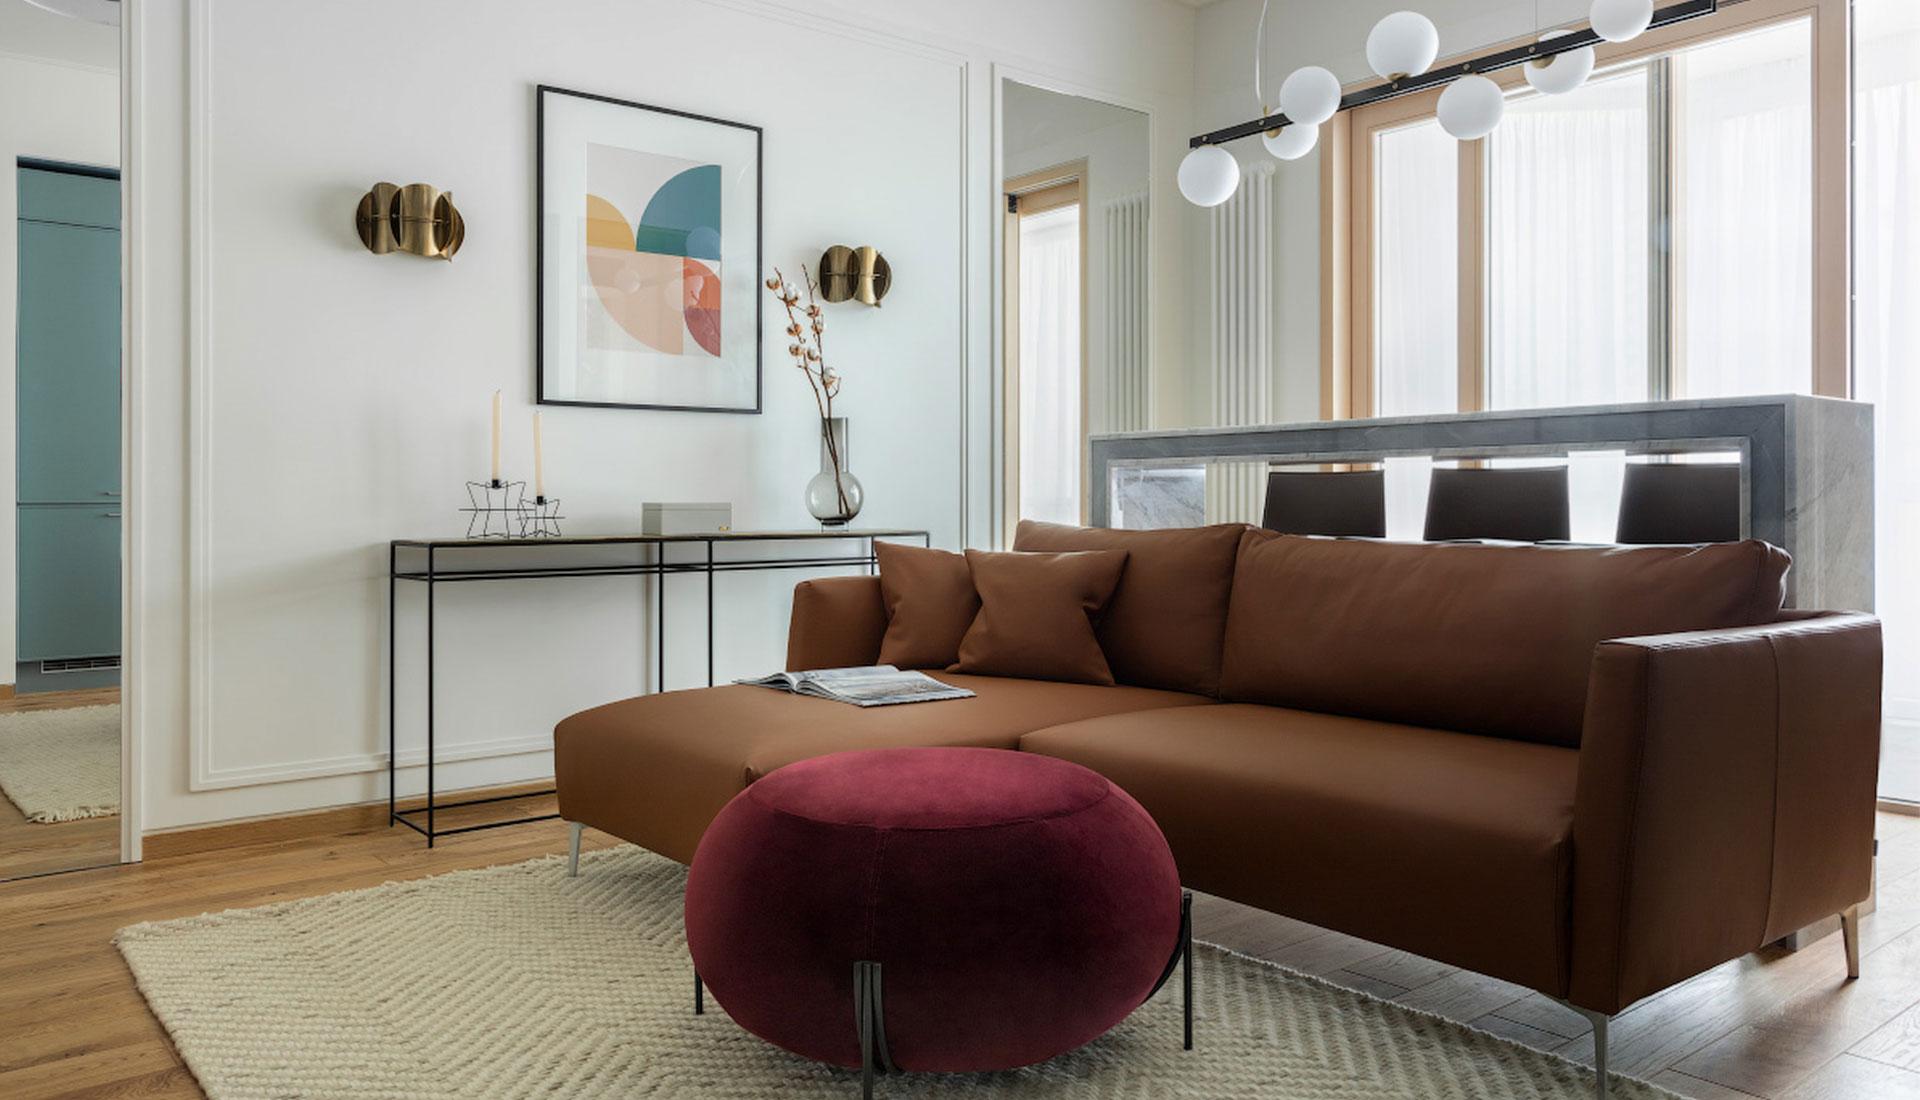 ANCconcept: квартира 45 кв. метров для сдачи в аренду